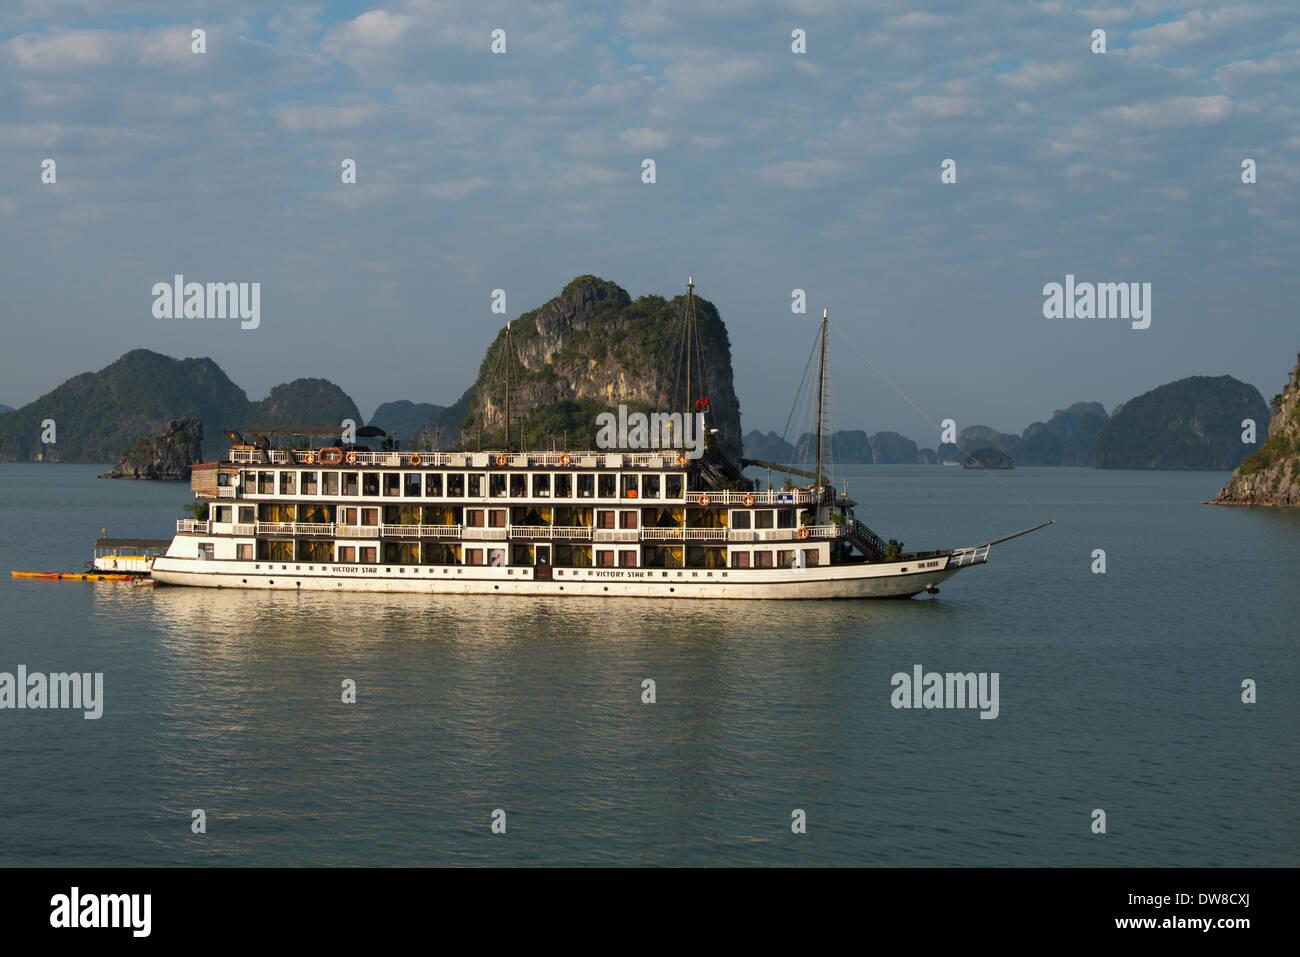 Cruising among the 3000 islets of Ha Long Bay - Stock Image